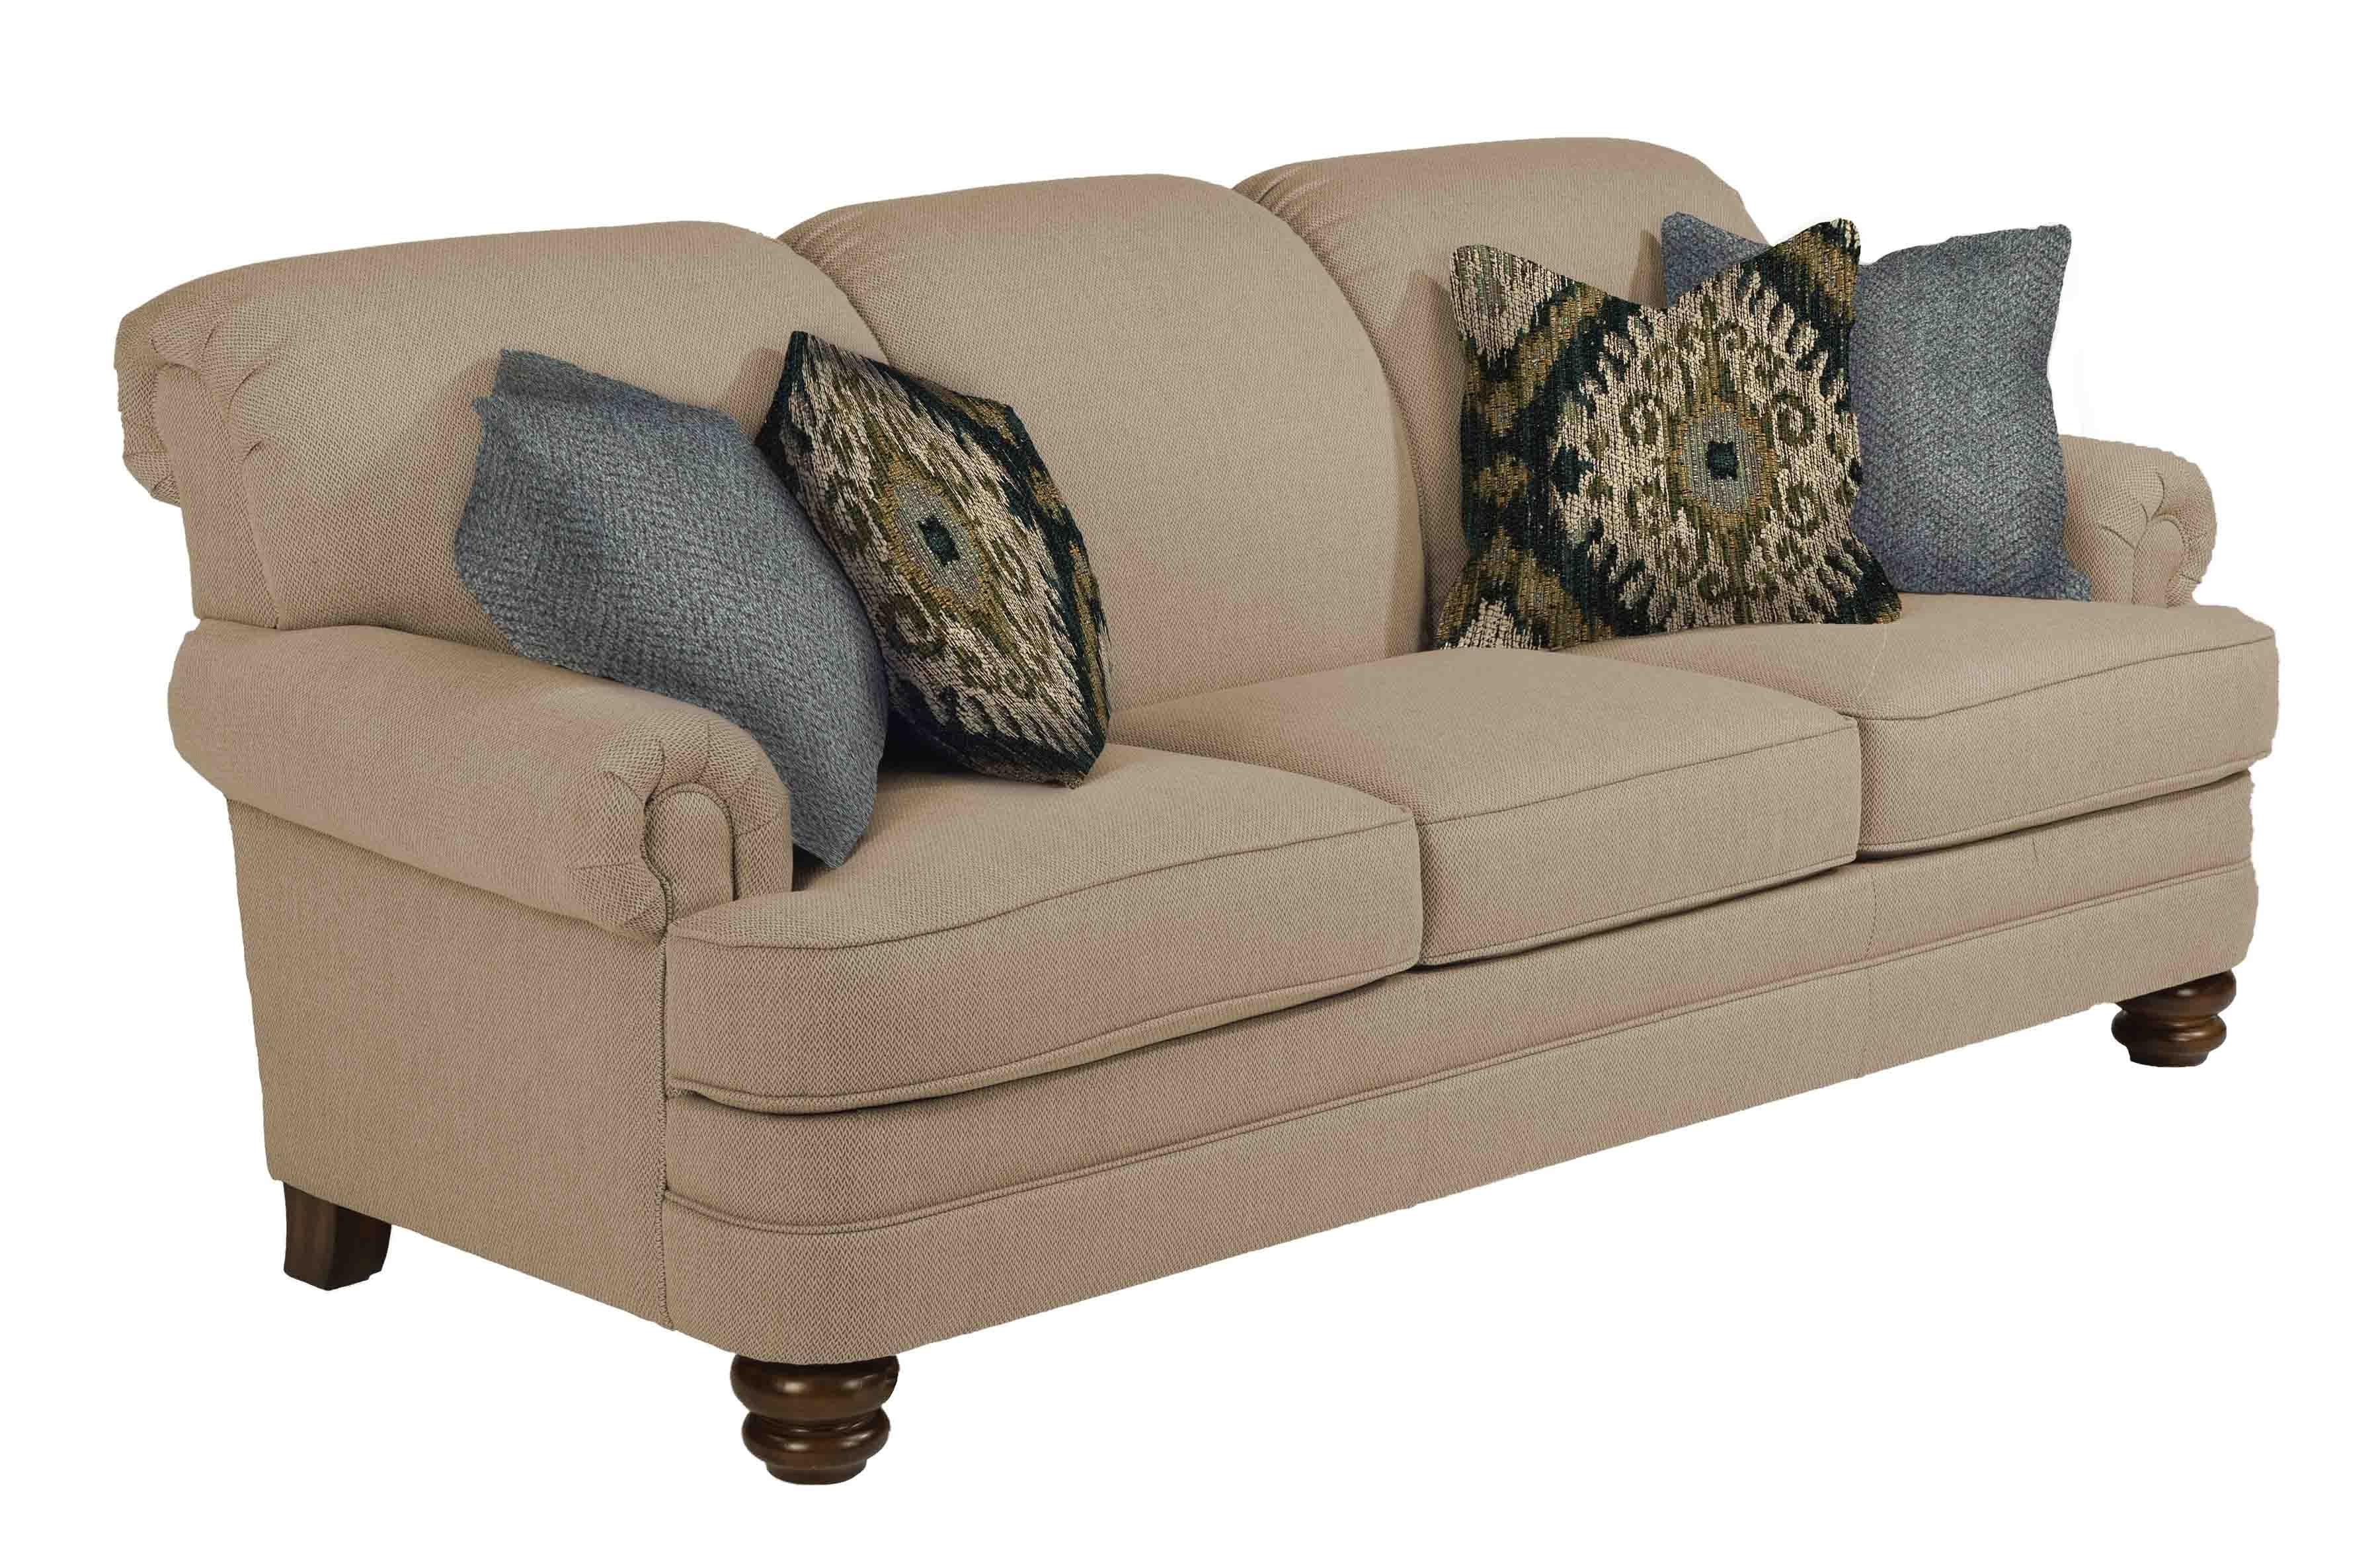 bay sofa fundas de la redoute flexsteel living room 85 bridge 411625 naturwood home at furnishings